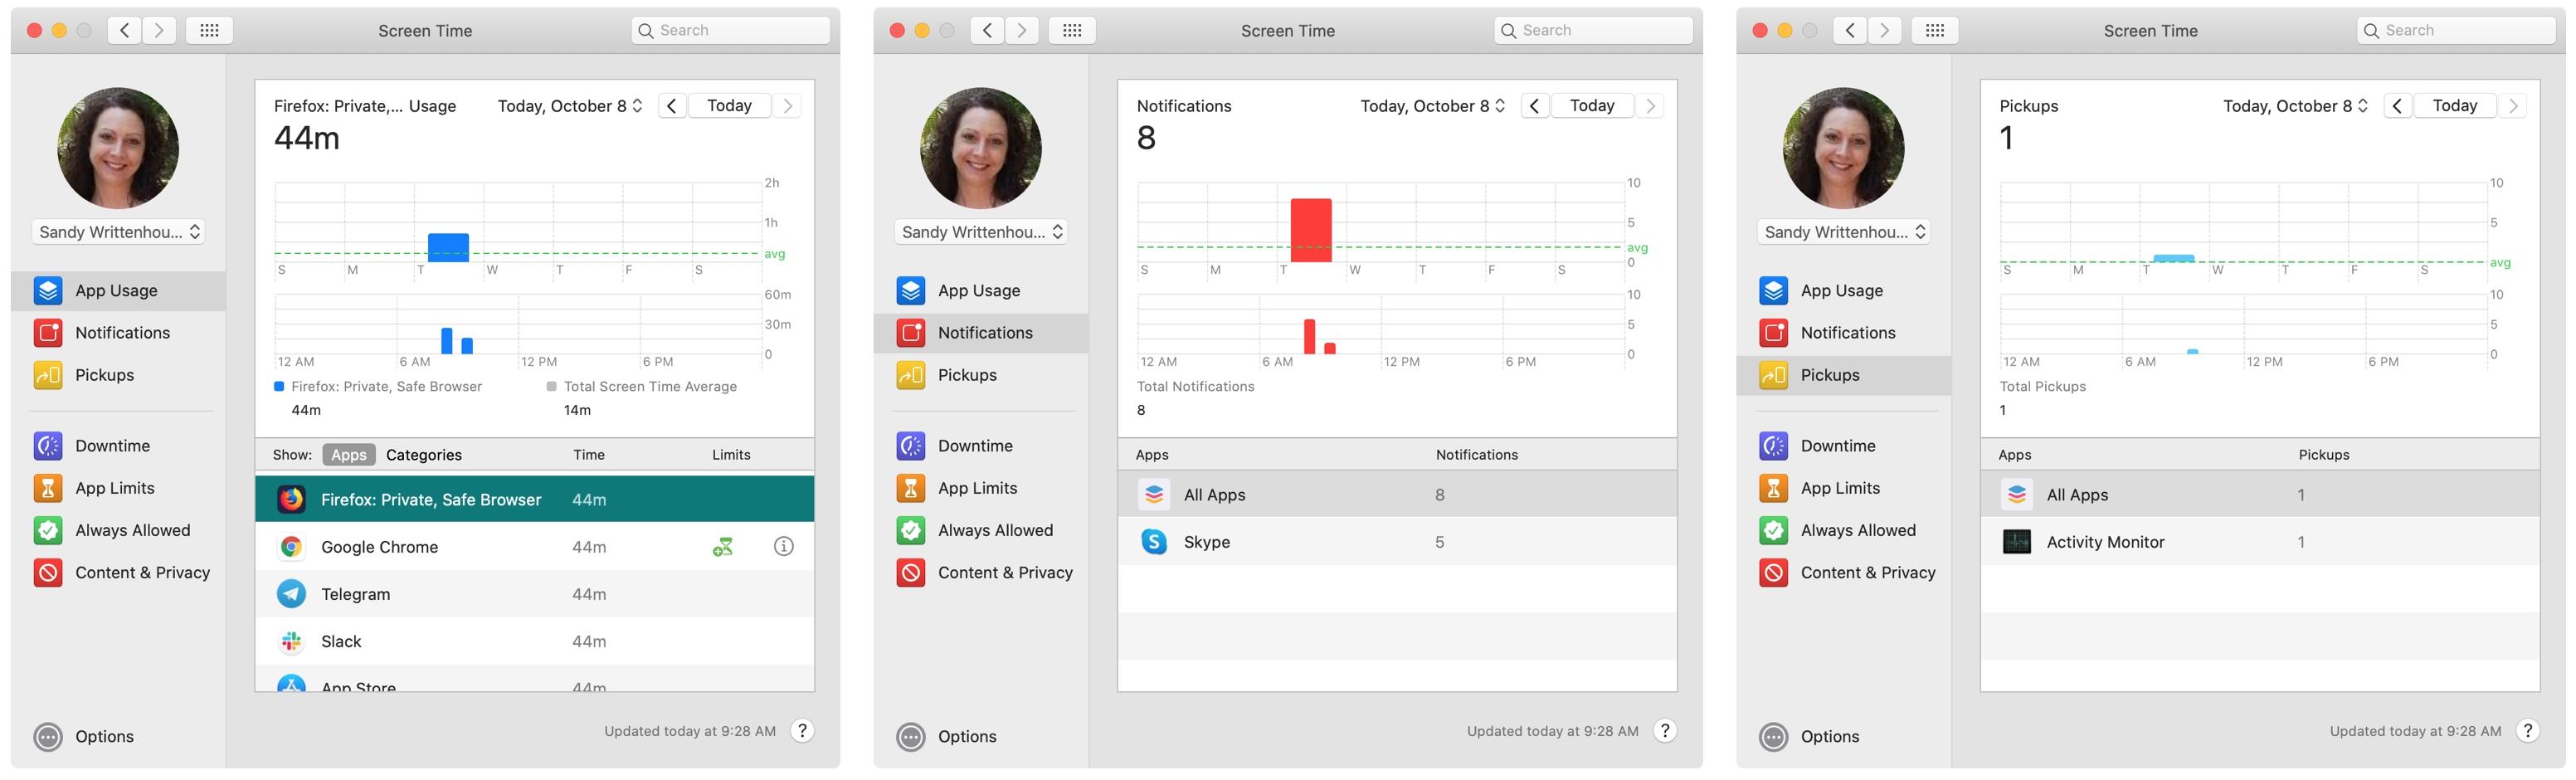 Screen Time Reports on Mac